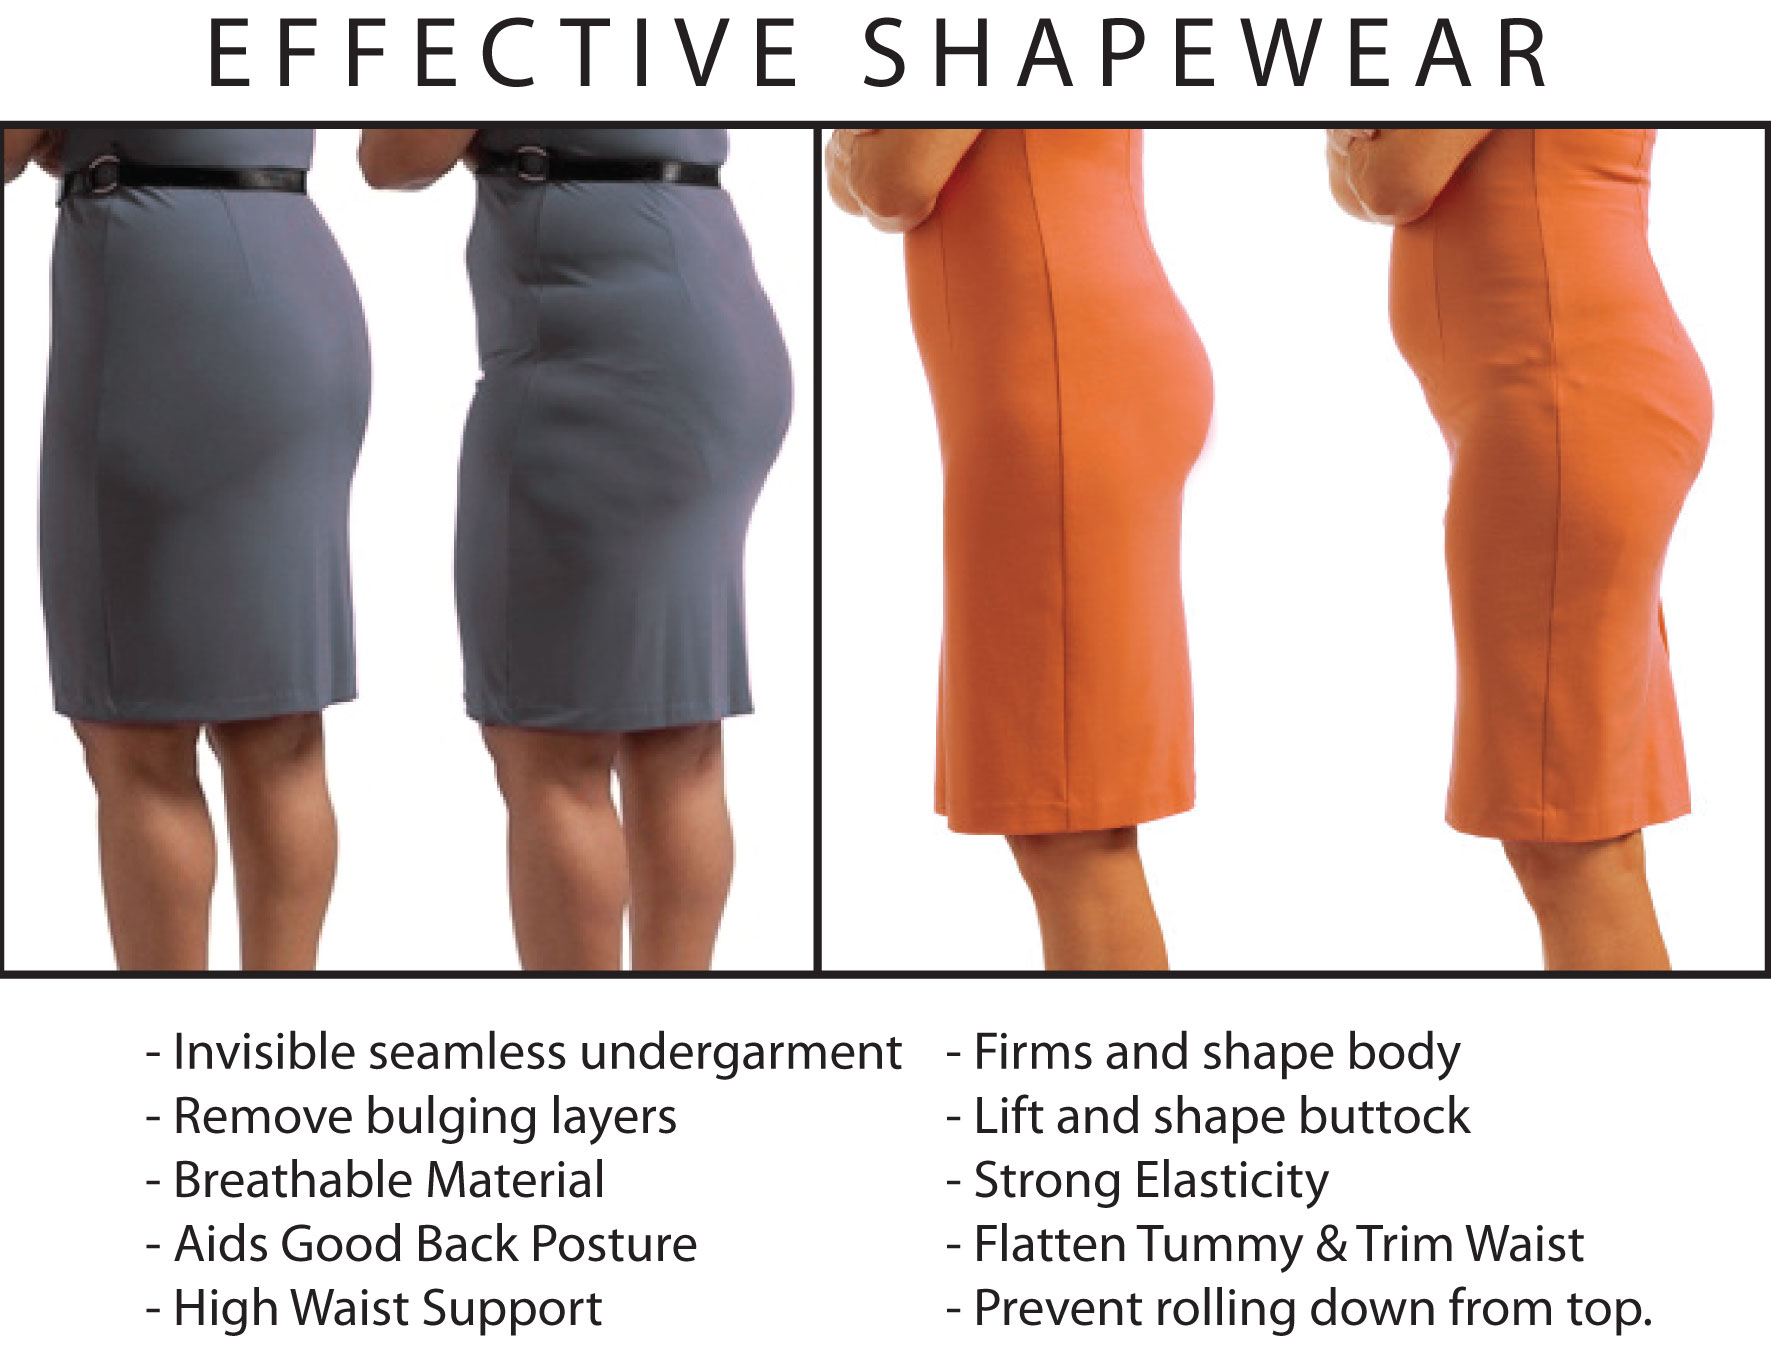 d9a8b96cb39cb ◣DIET SLIM BODYSHAPER◥ Instant Flat Tummy No Bulging Sides Lift Butt Body  Shaper Underwear Plus Size Shapewear